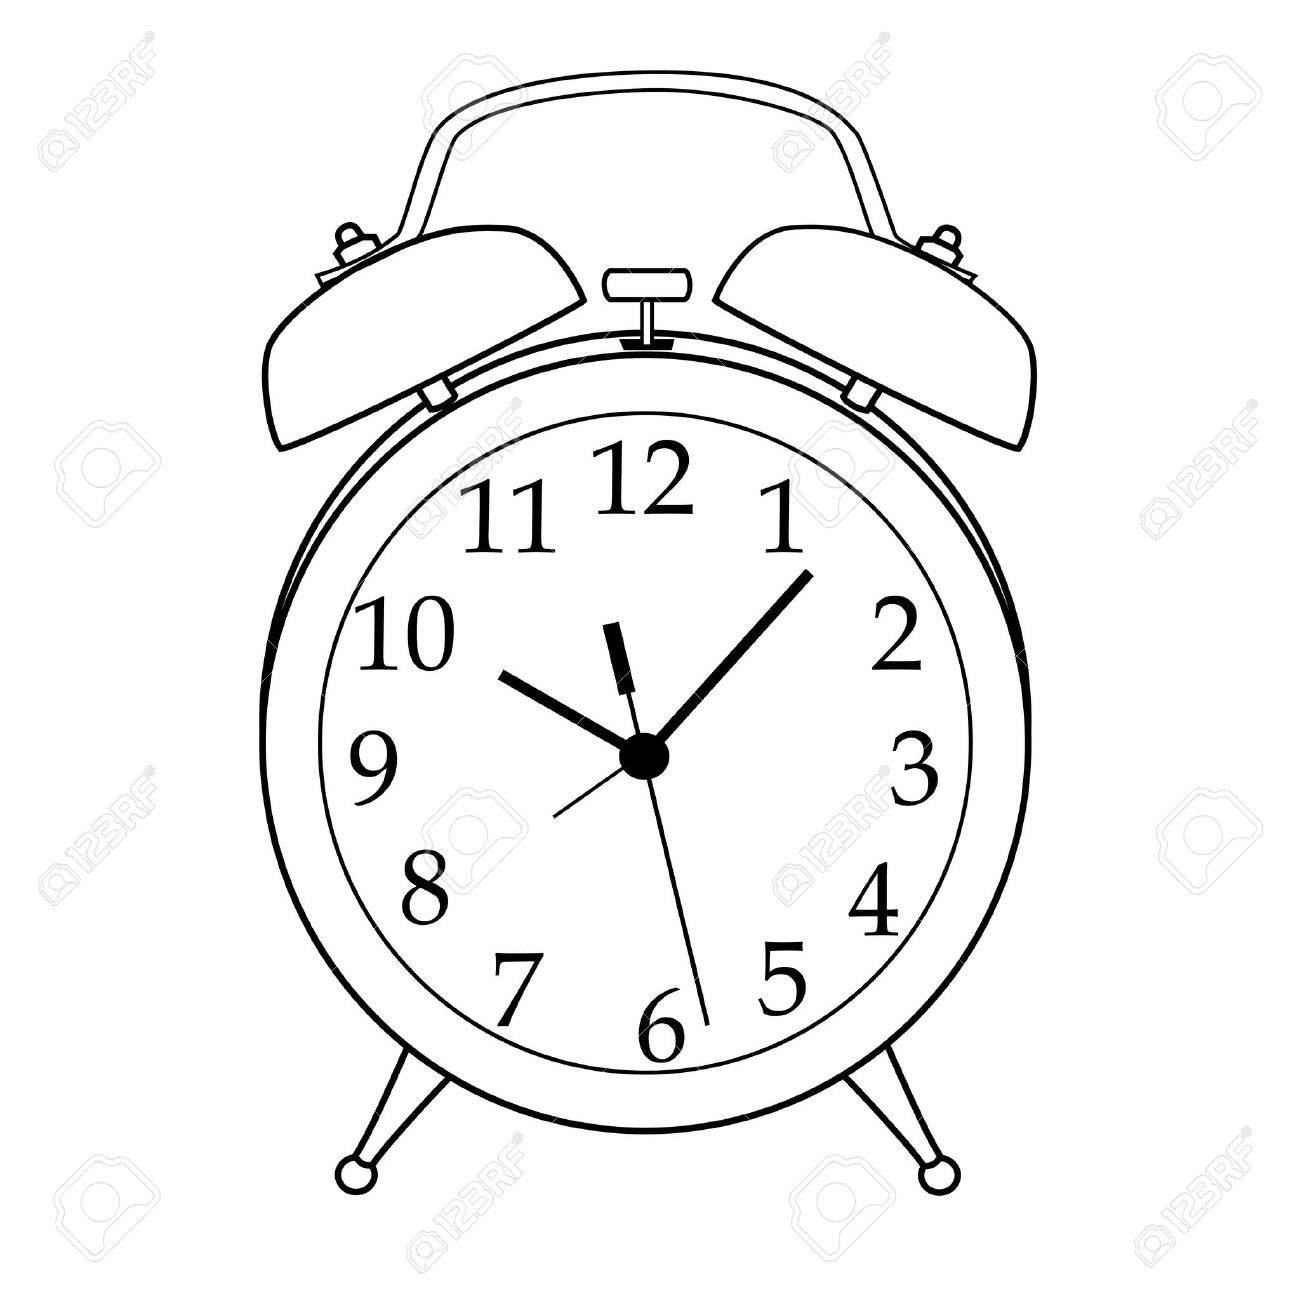 Illustration of isolated black and white cartoon alarm clock.